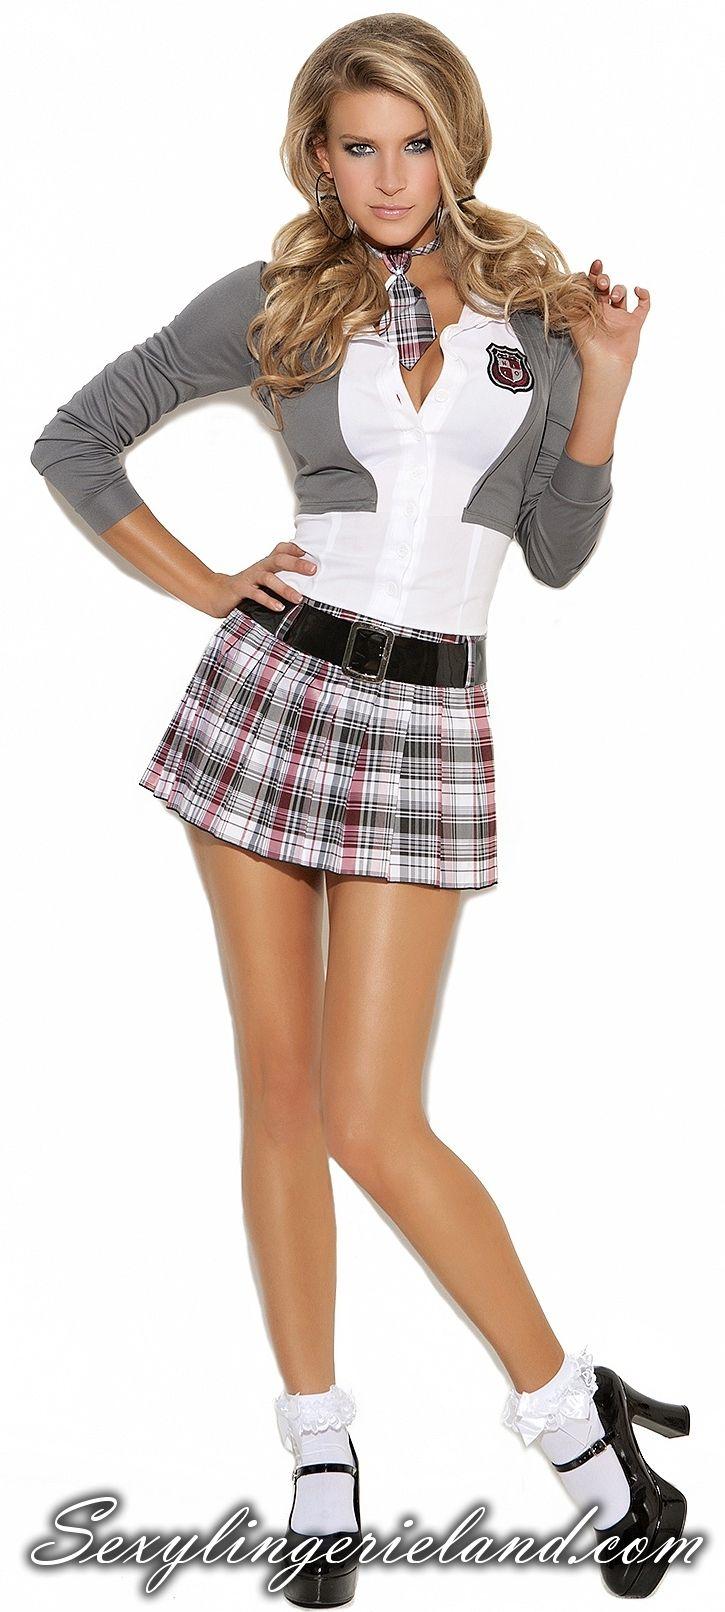 School girl purn video-6247